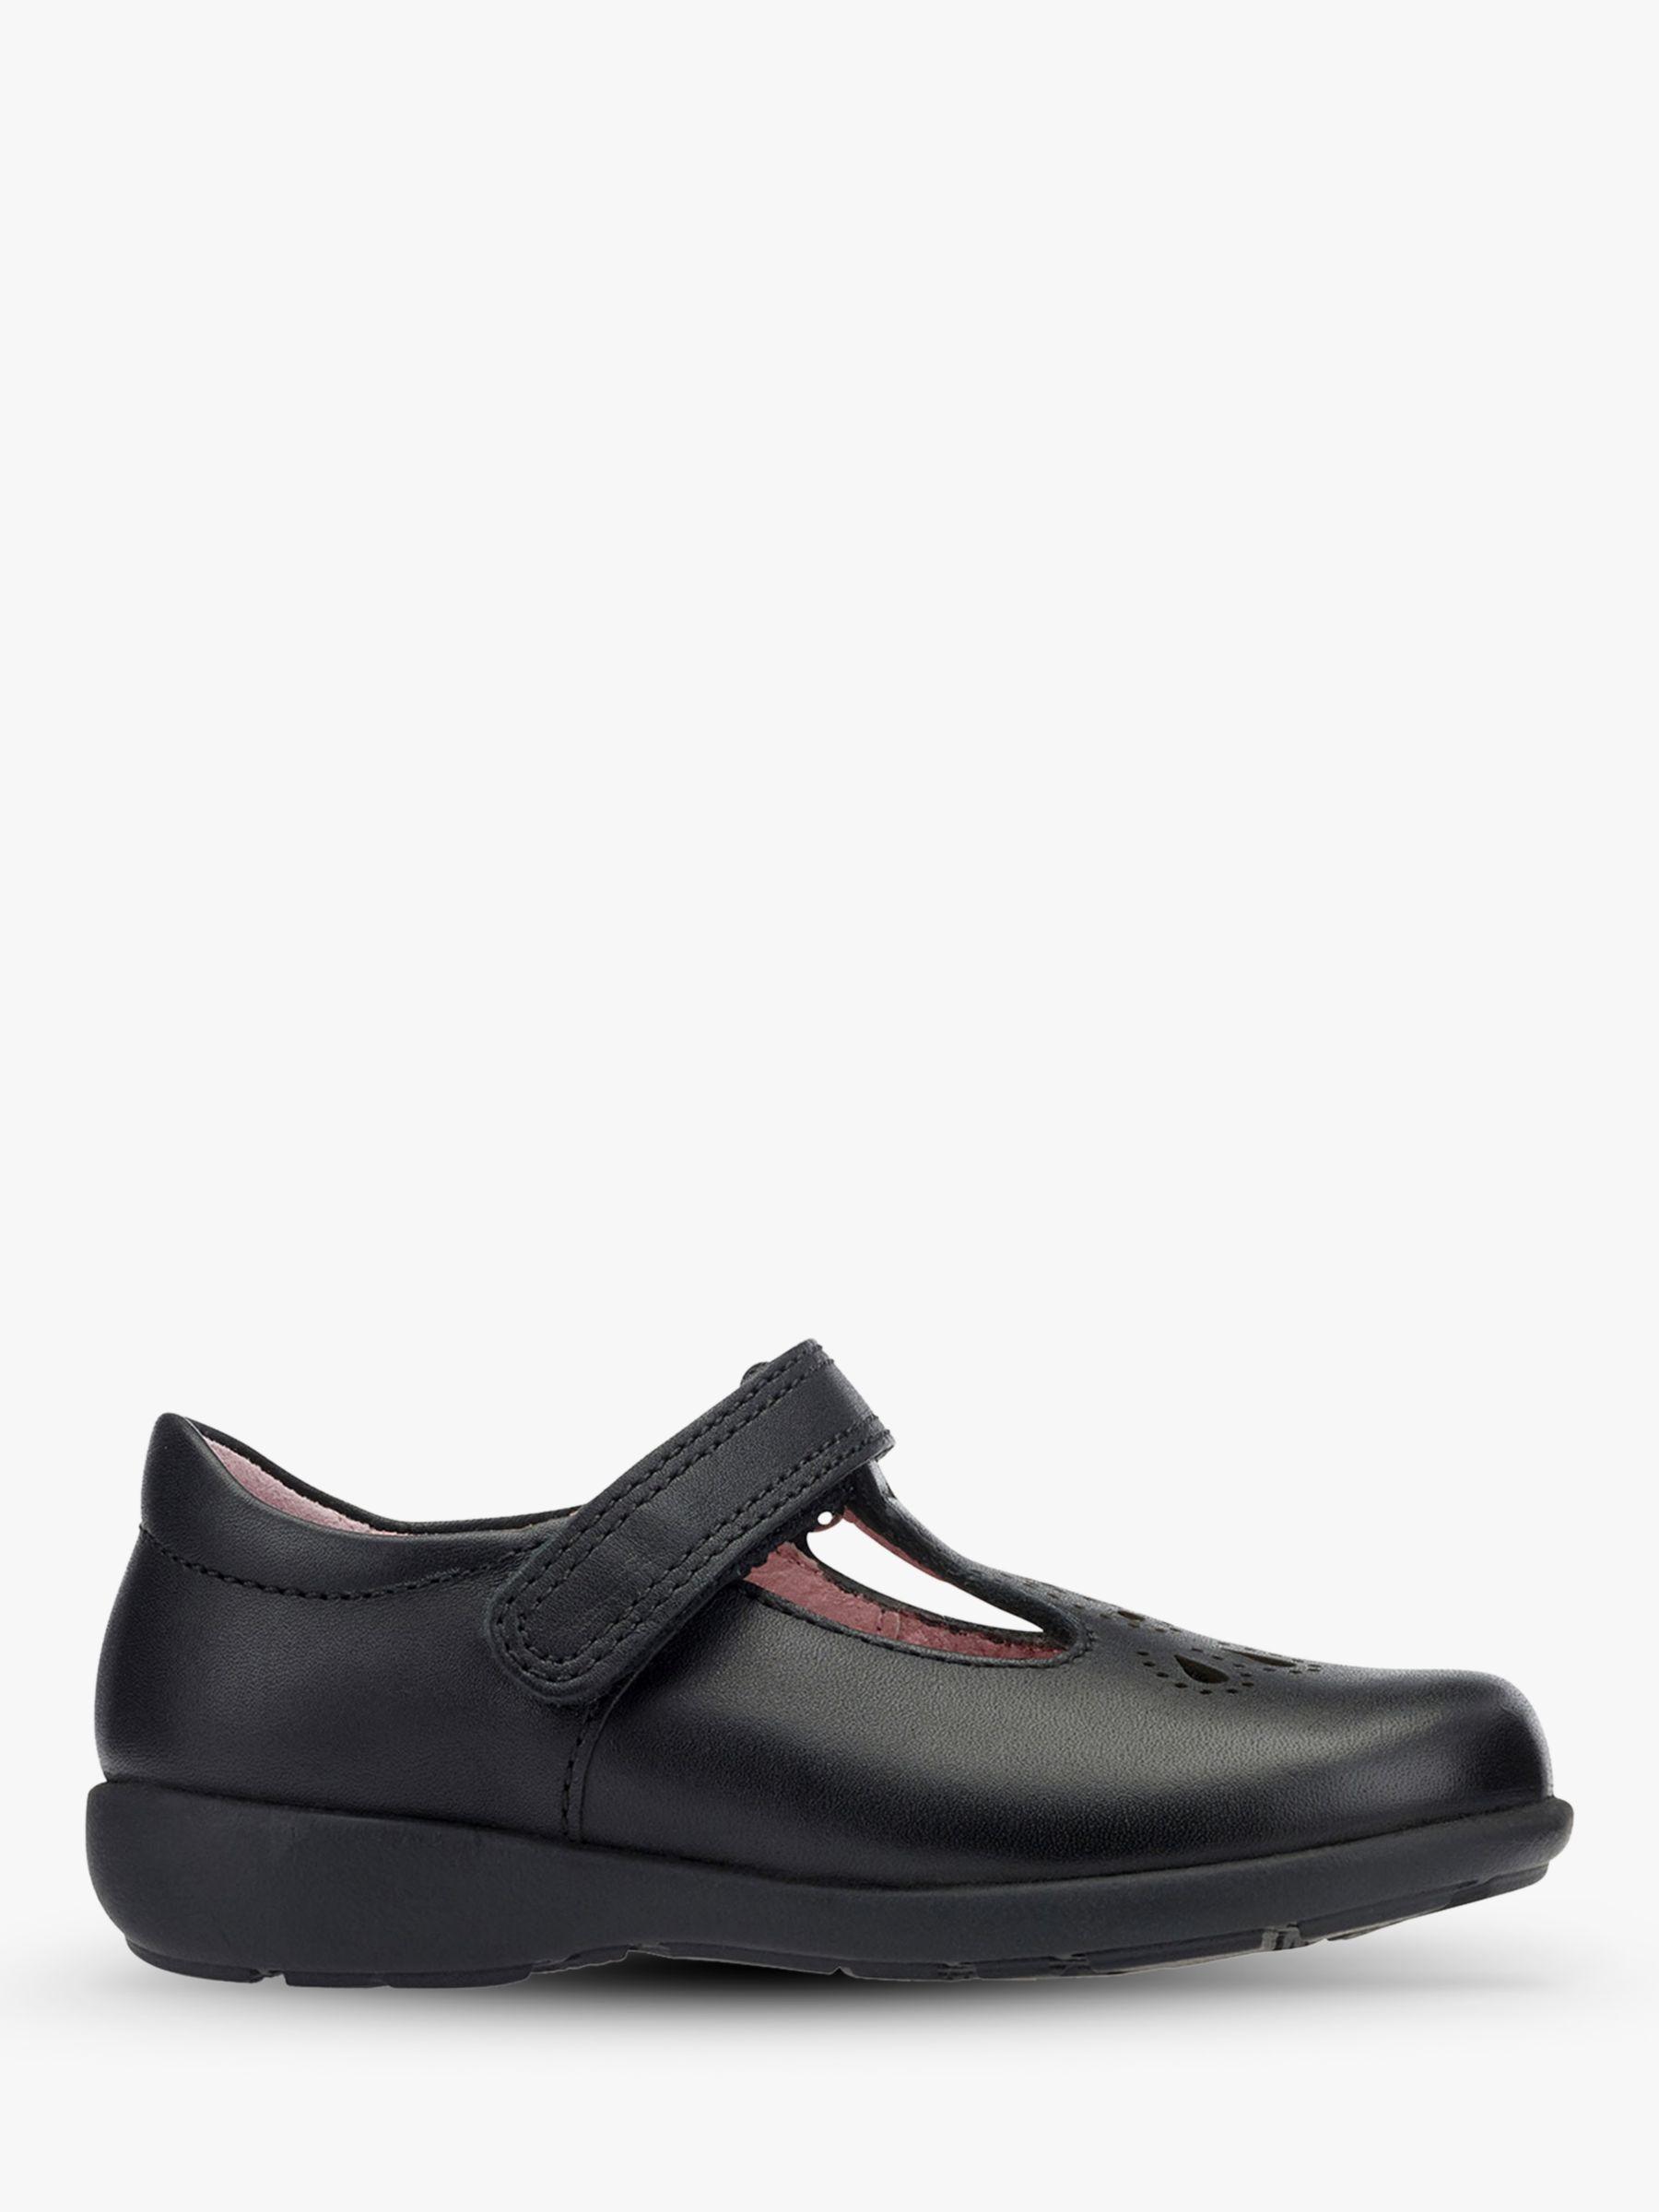 Start-Rite Start-rite Children's Daisy May Leather Shoes, Black